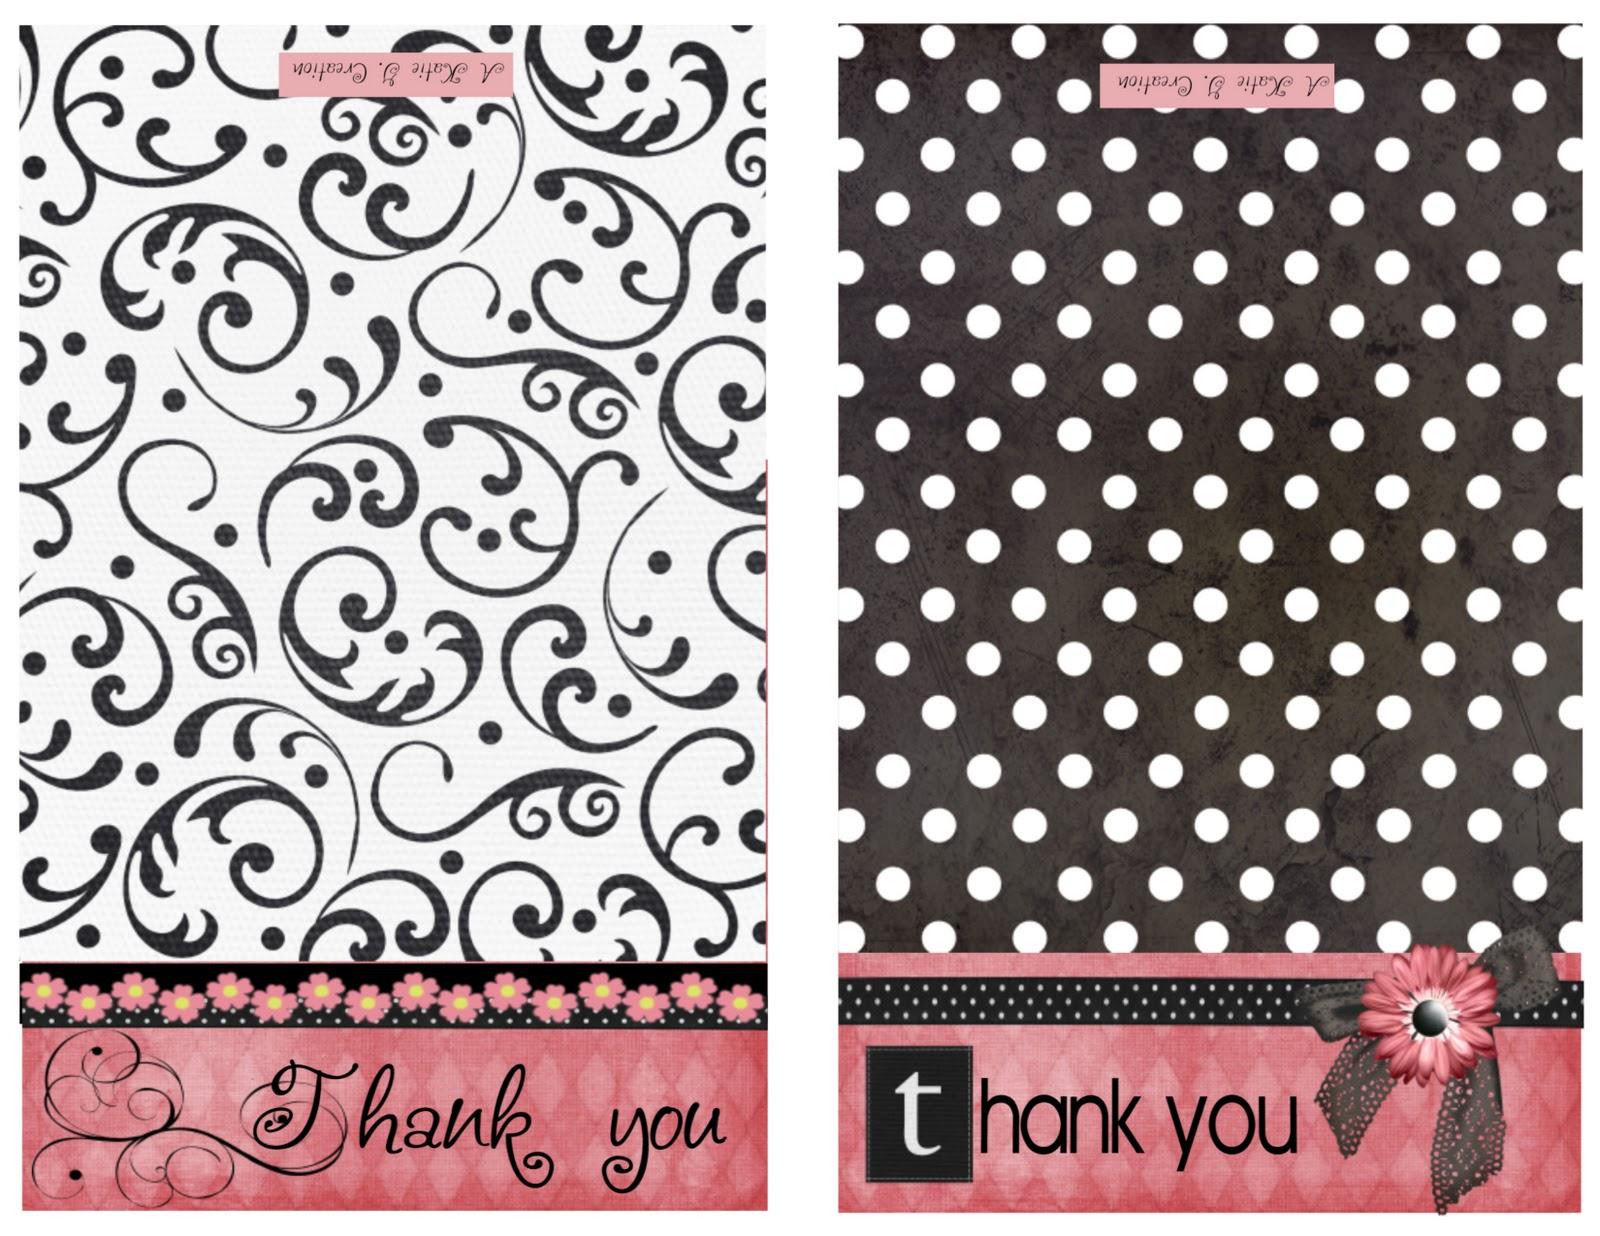 Comprehensive image regarding thank you cards printable